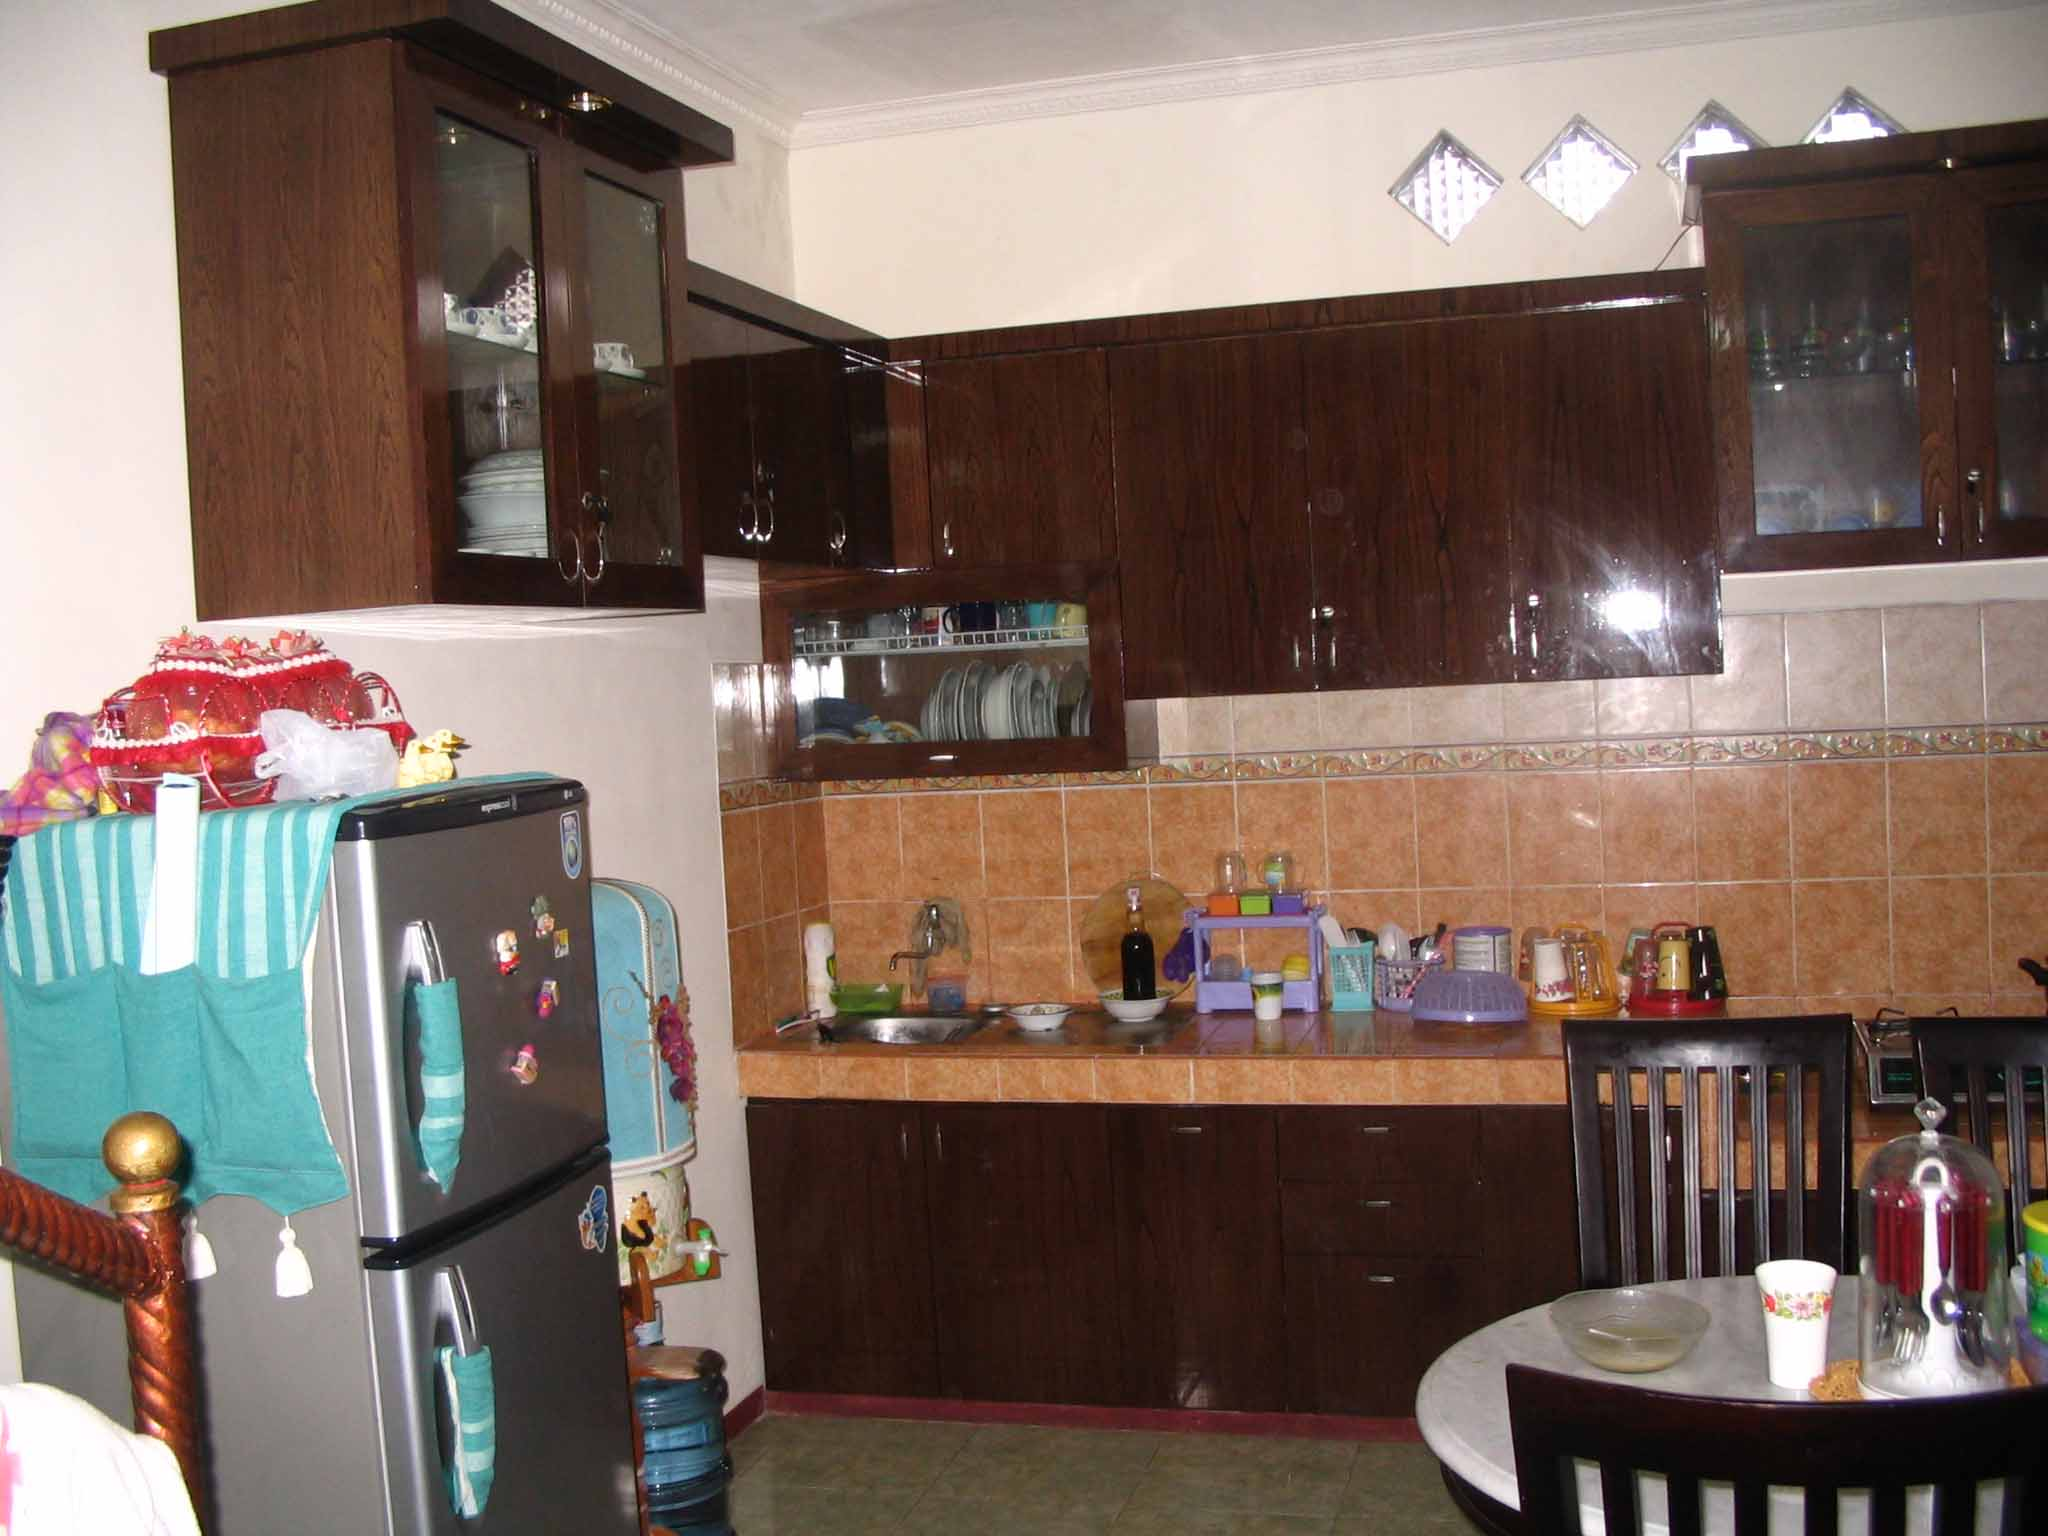 Kitchen set dapur furniture mebel interior for Kitchen dapur